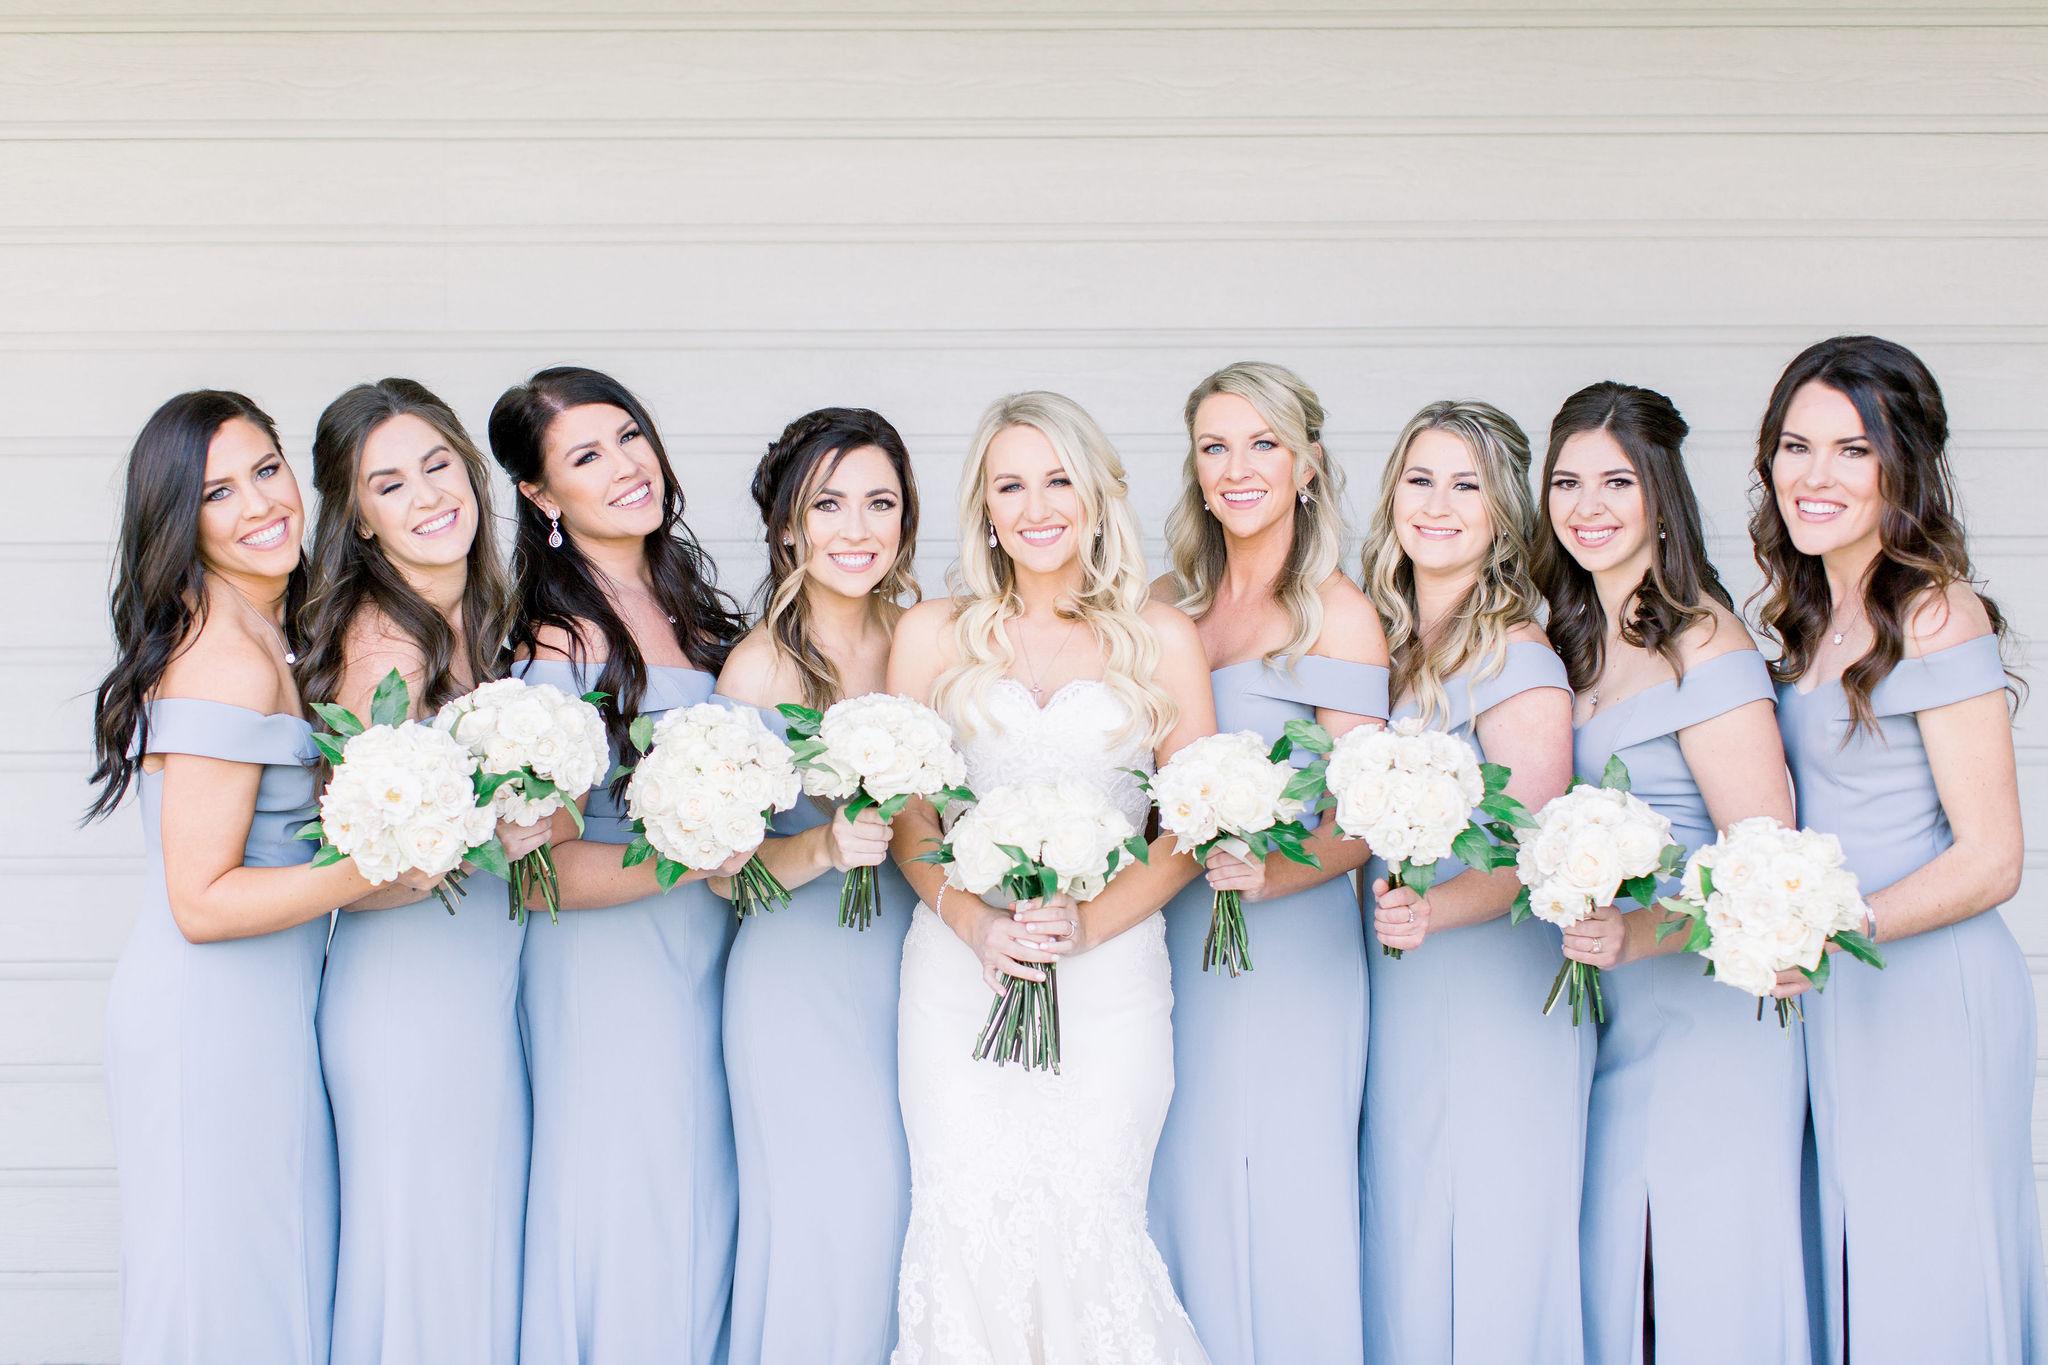 sydney-bodi-wedding-budget-friendly-blooms-carmel-mountain-white-flowers-5.jpg